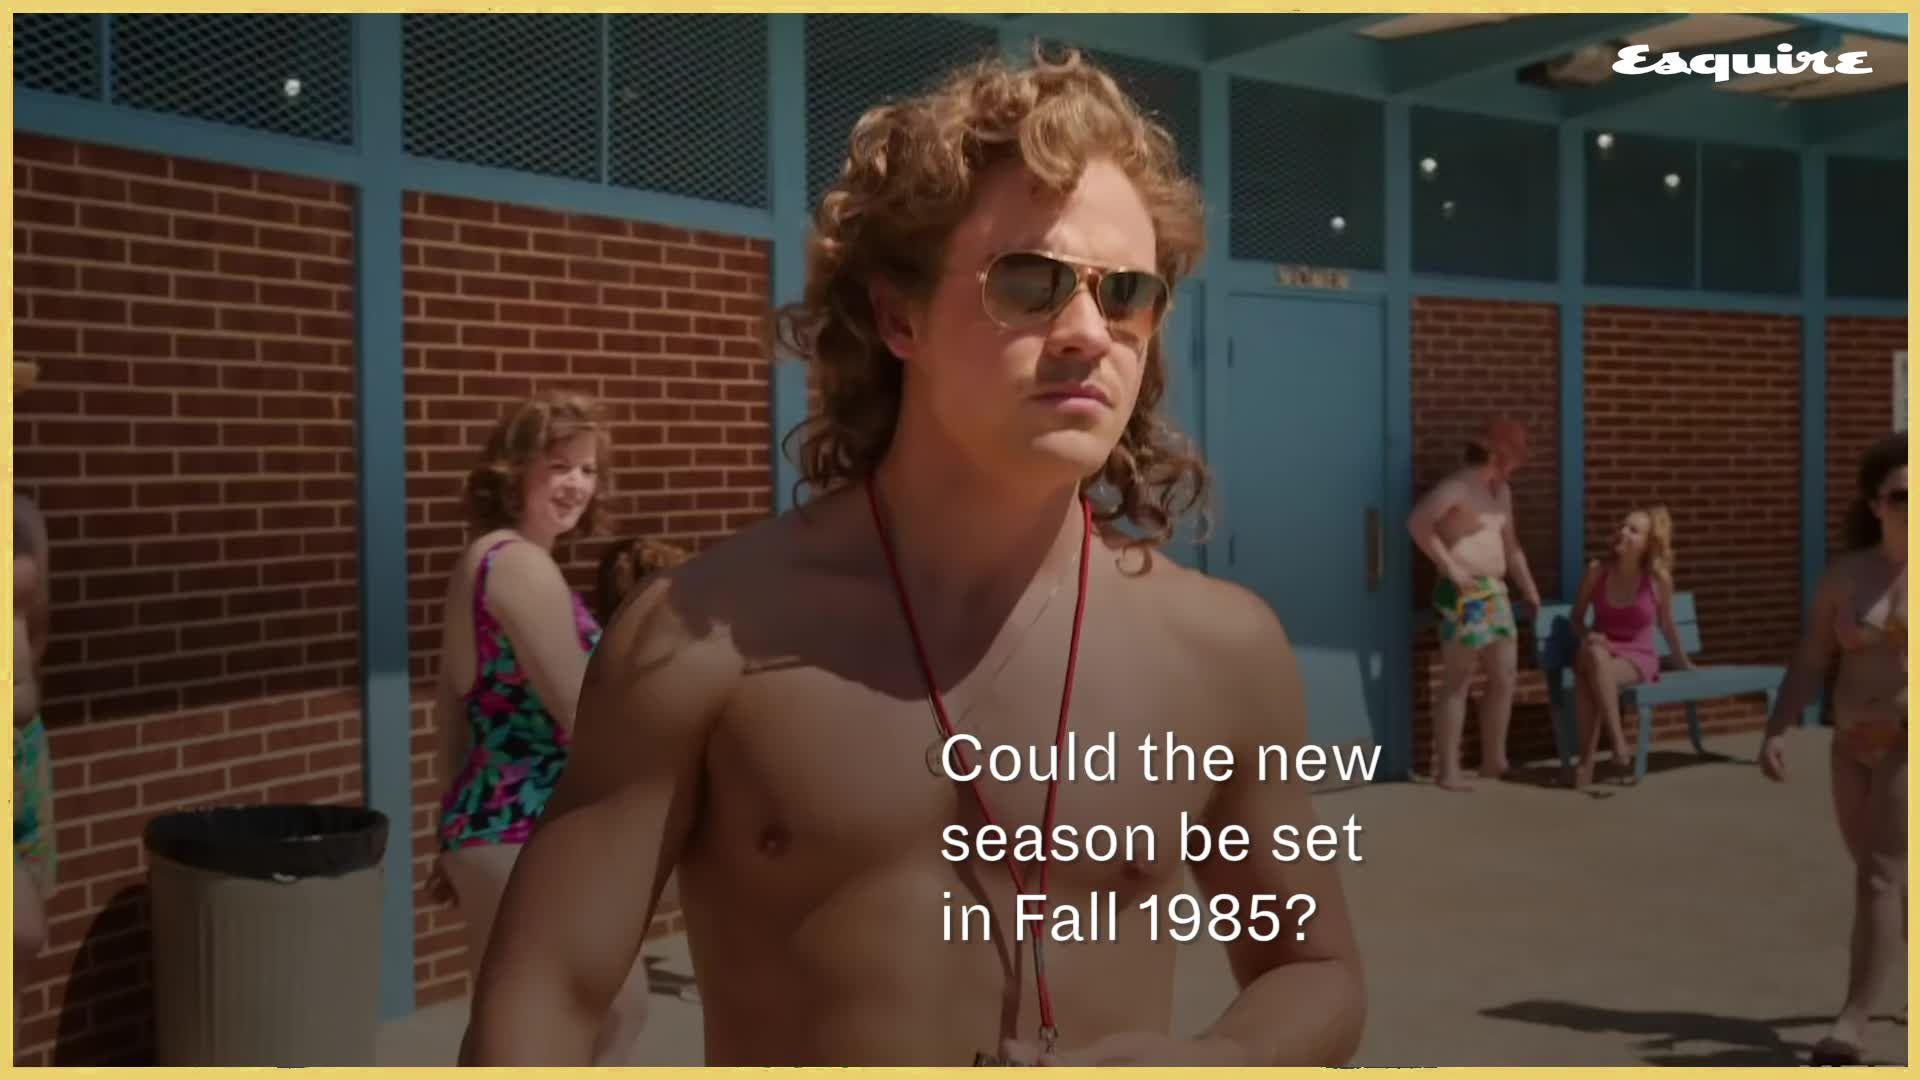 Gaten Matarazzo Thought A Fan Video Was A 'Stranger Things' Season 3 Plot Leak